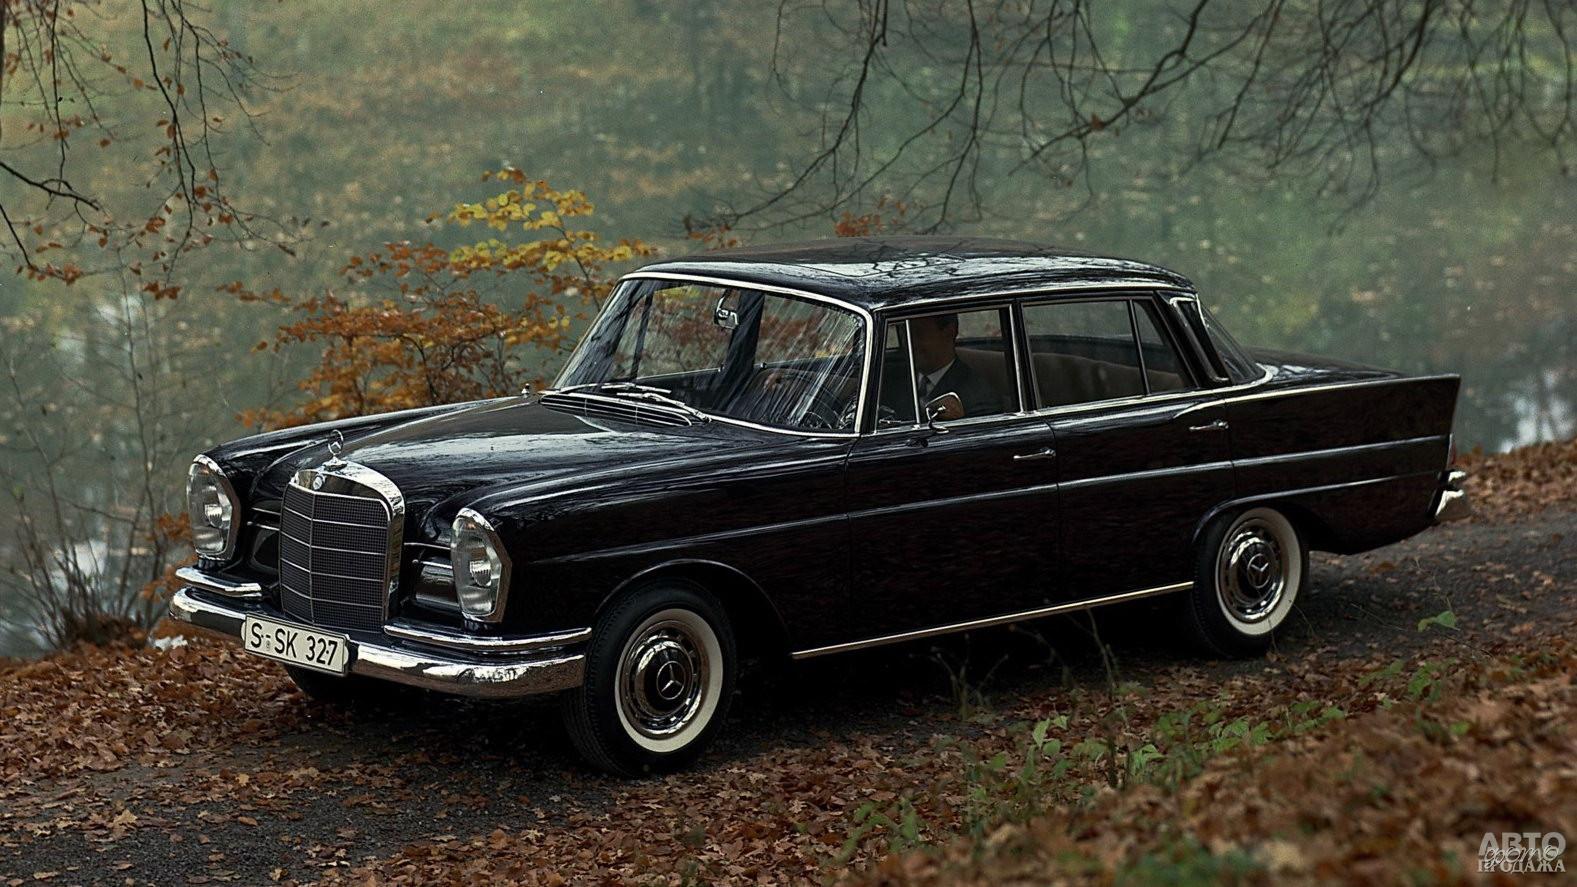 Mеrcedes-Benz 220 S (W111) 1959 года